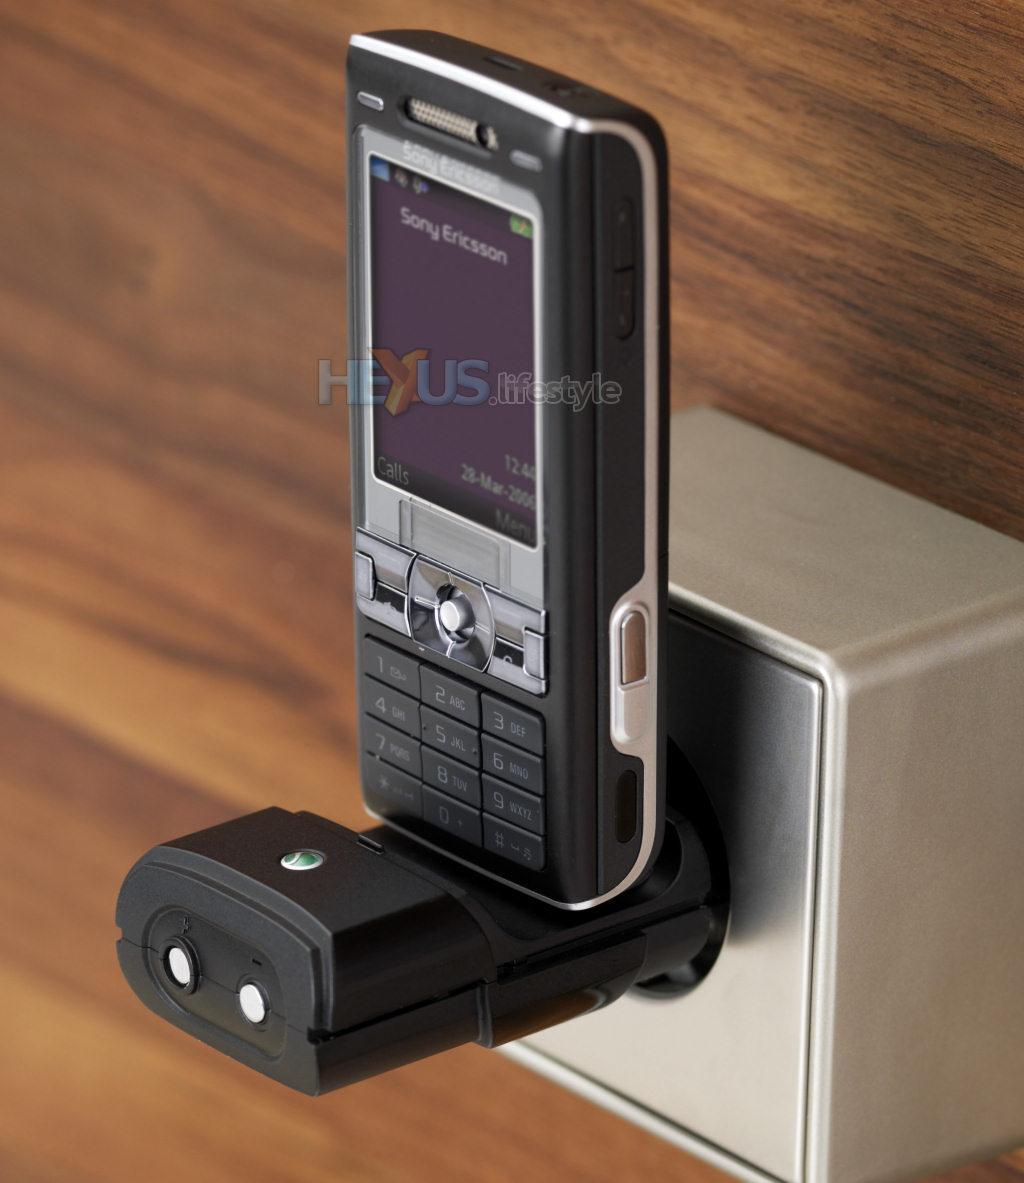 Sony Ericsson Addresses Flat Battery Need To Make Call